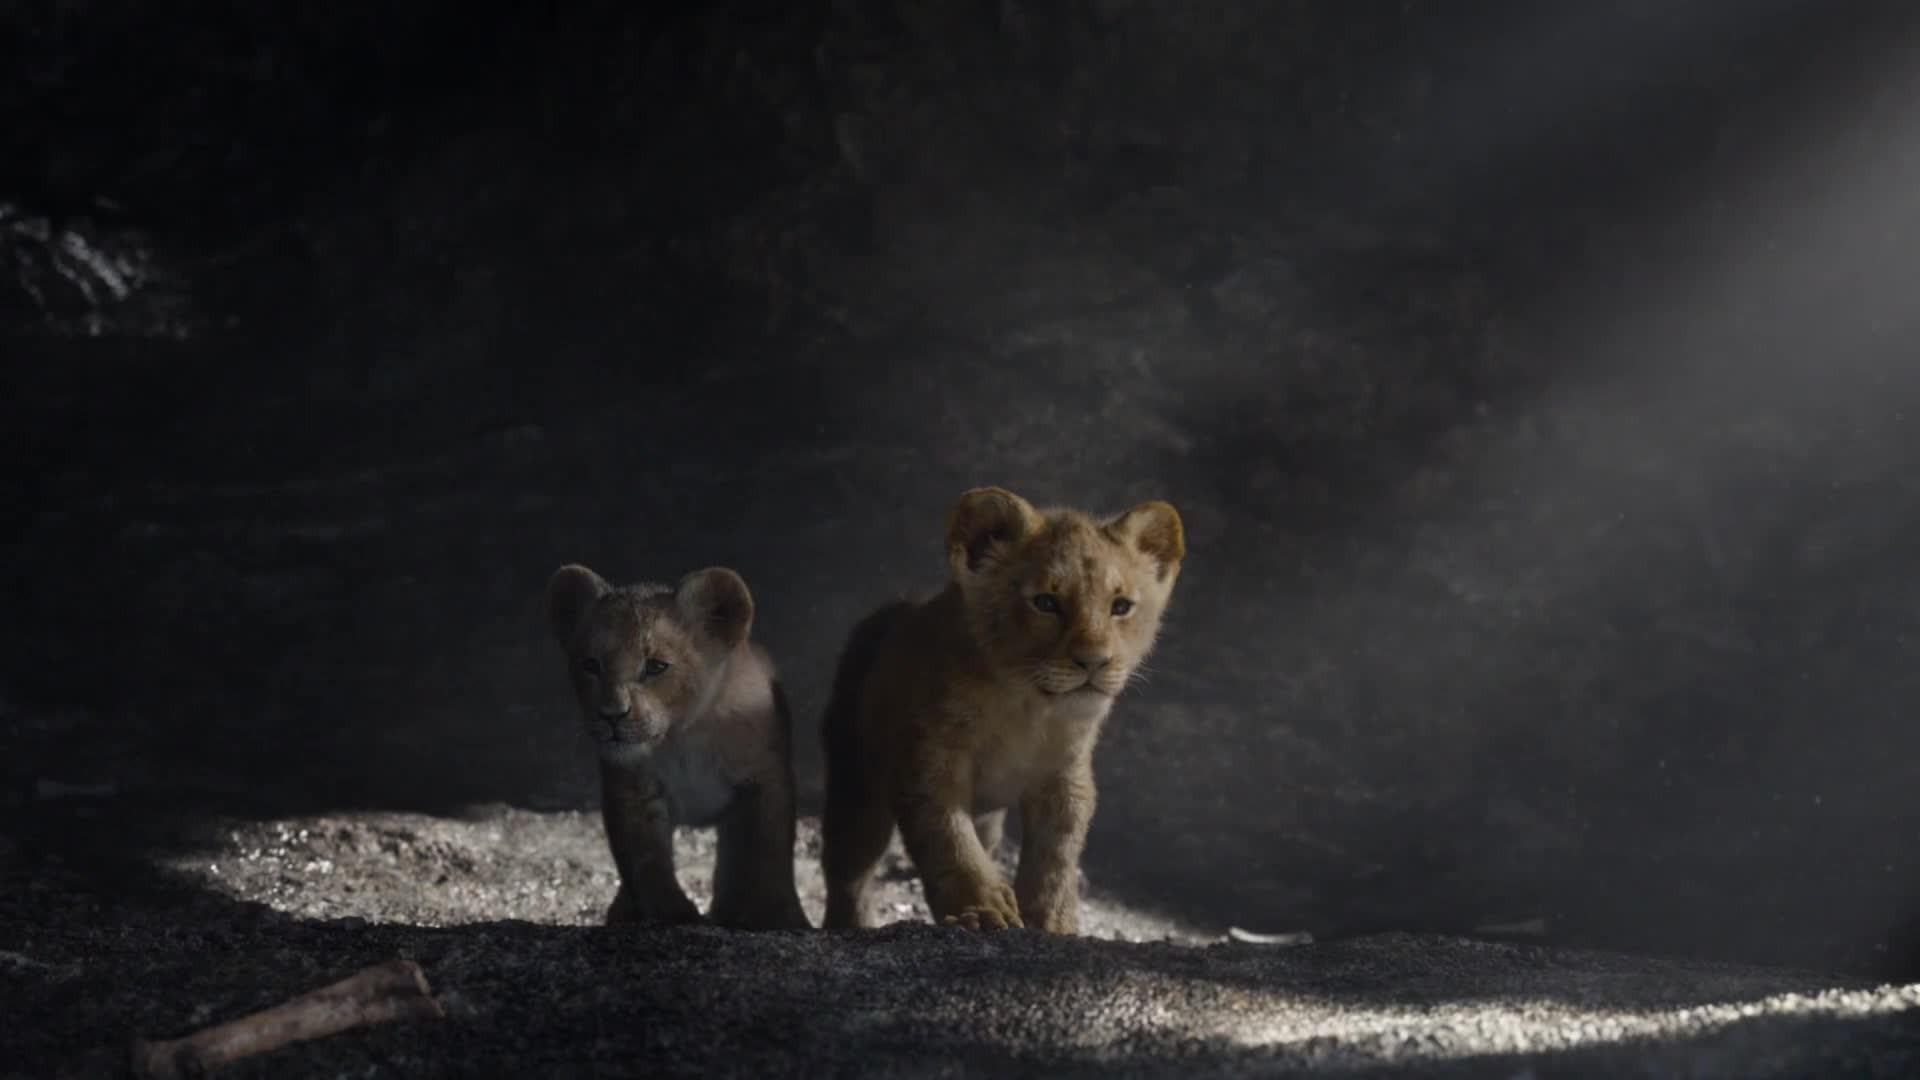 The.Lion.King.2019.1080p.BluRay تحميل تورنت 10 arabp2p.com